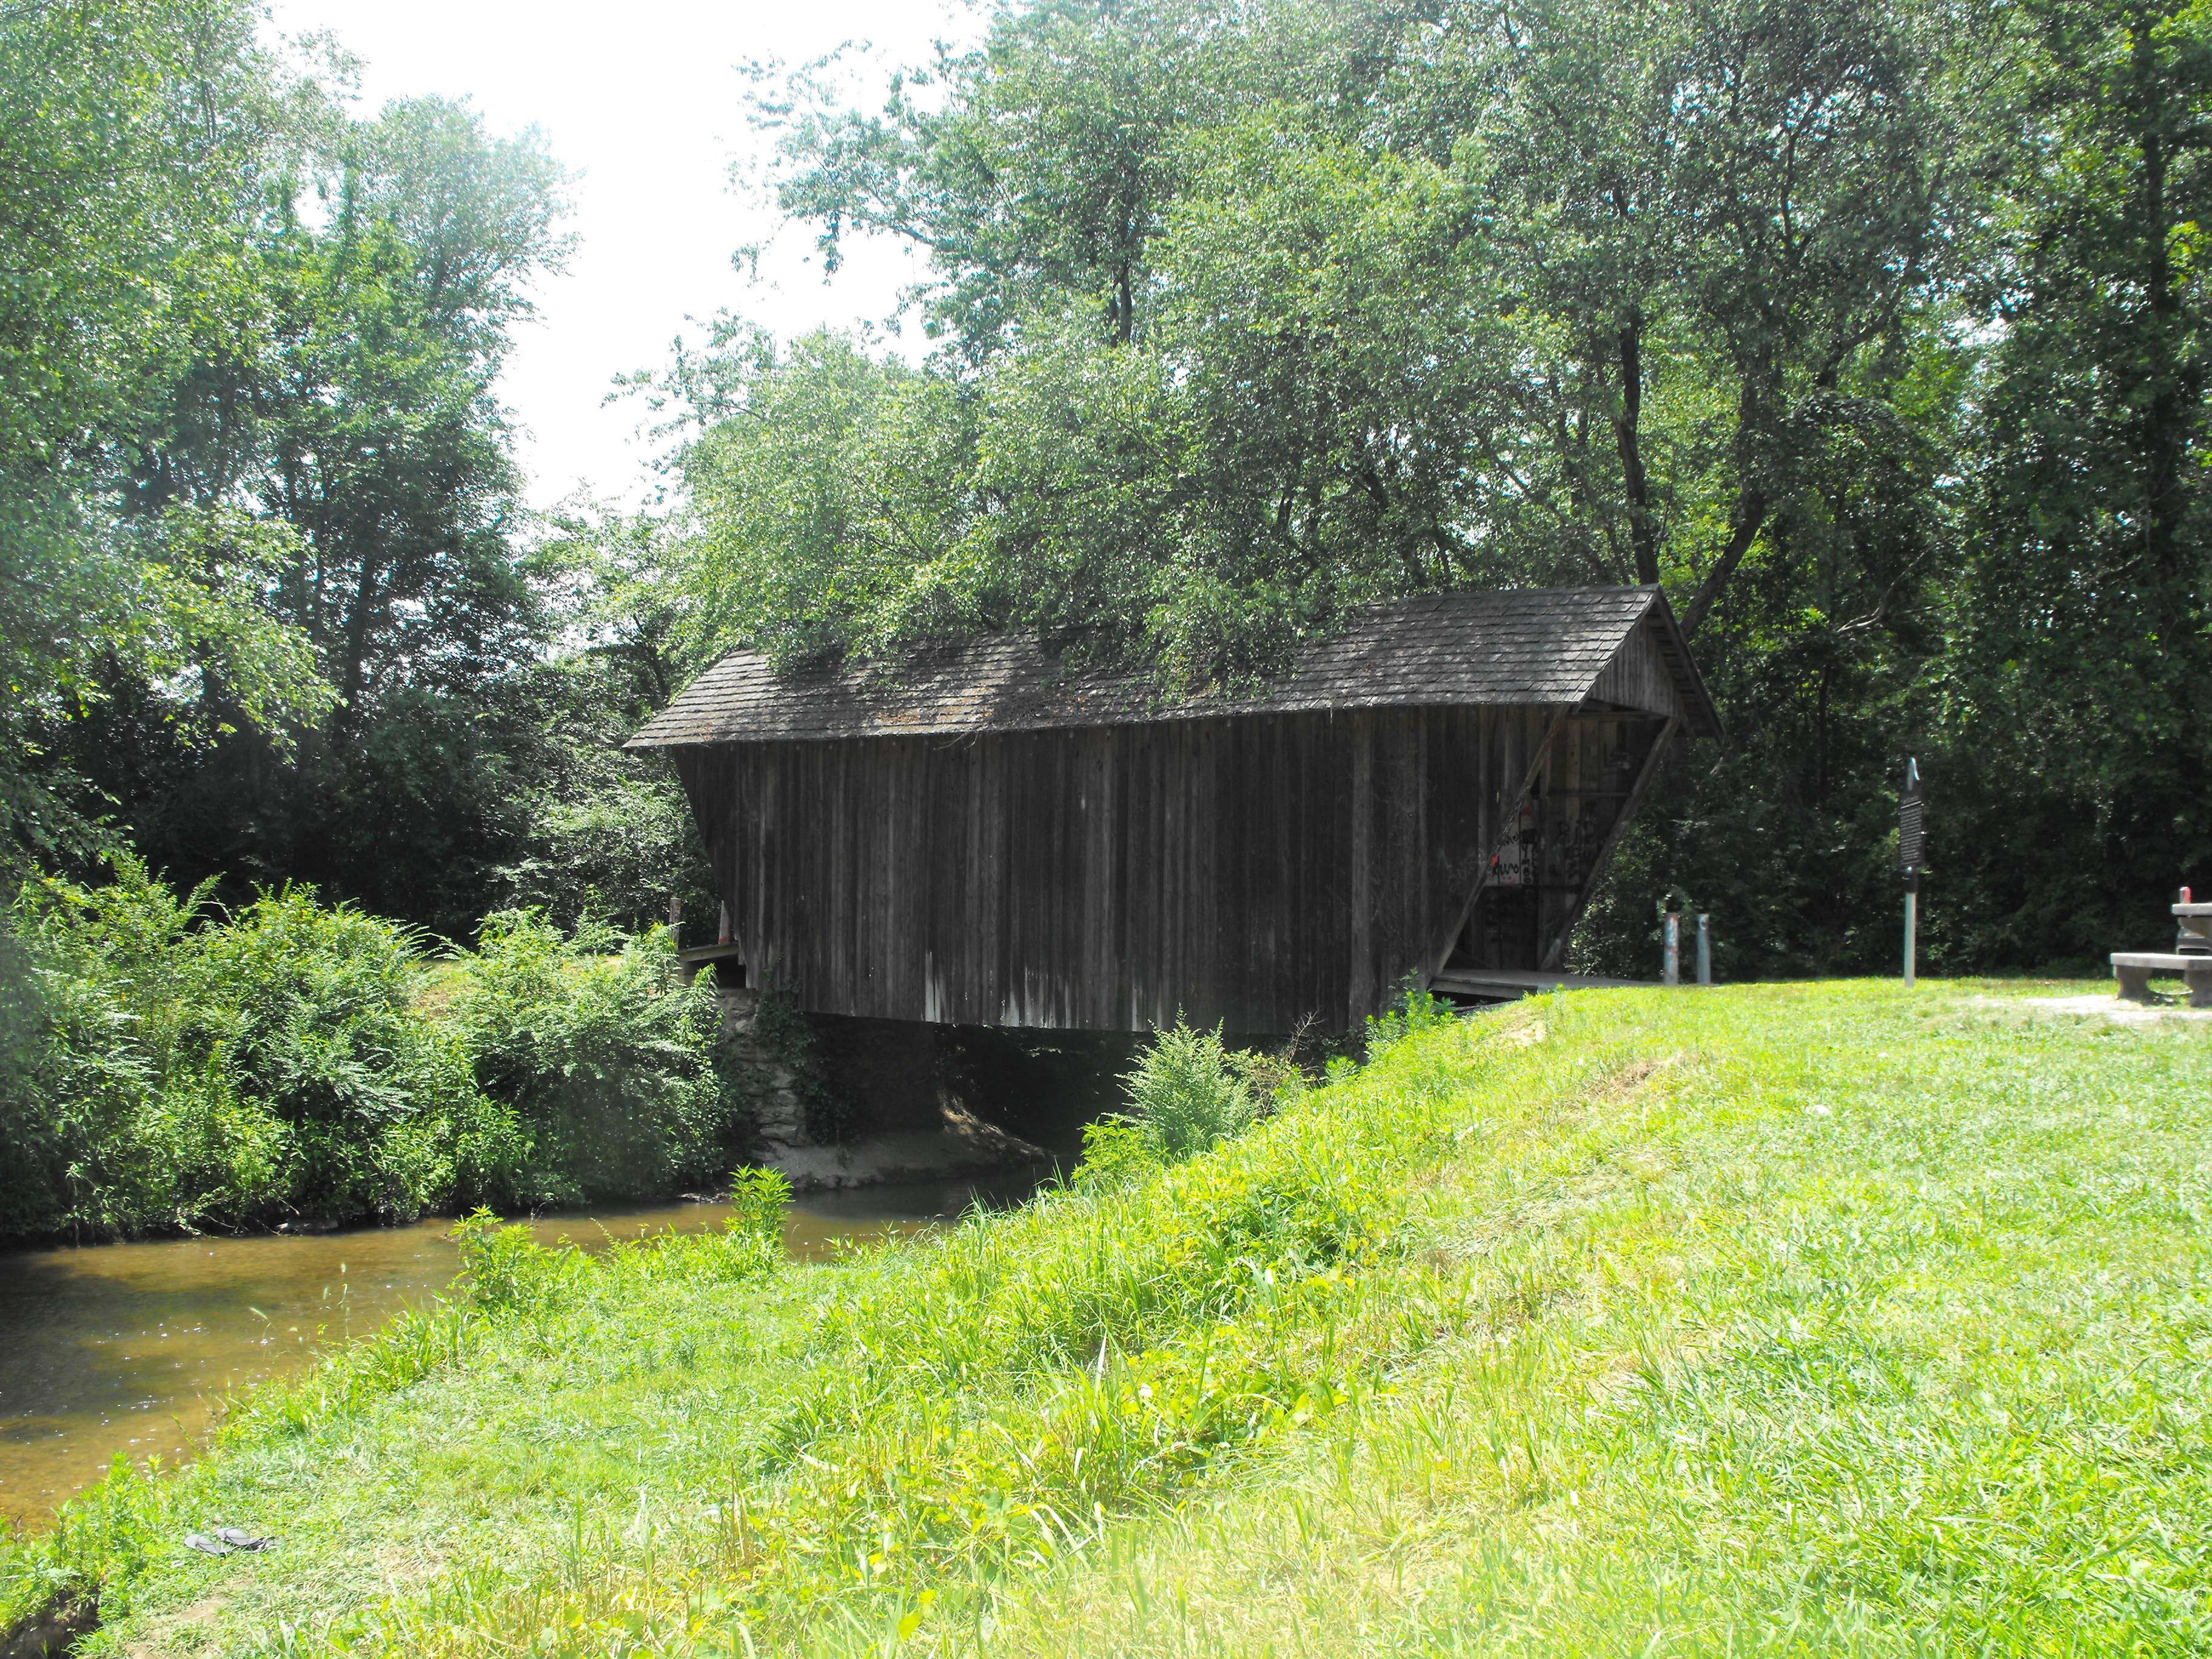 georgia, stovall mill, covered bridge